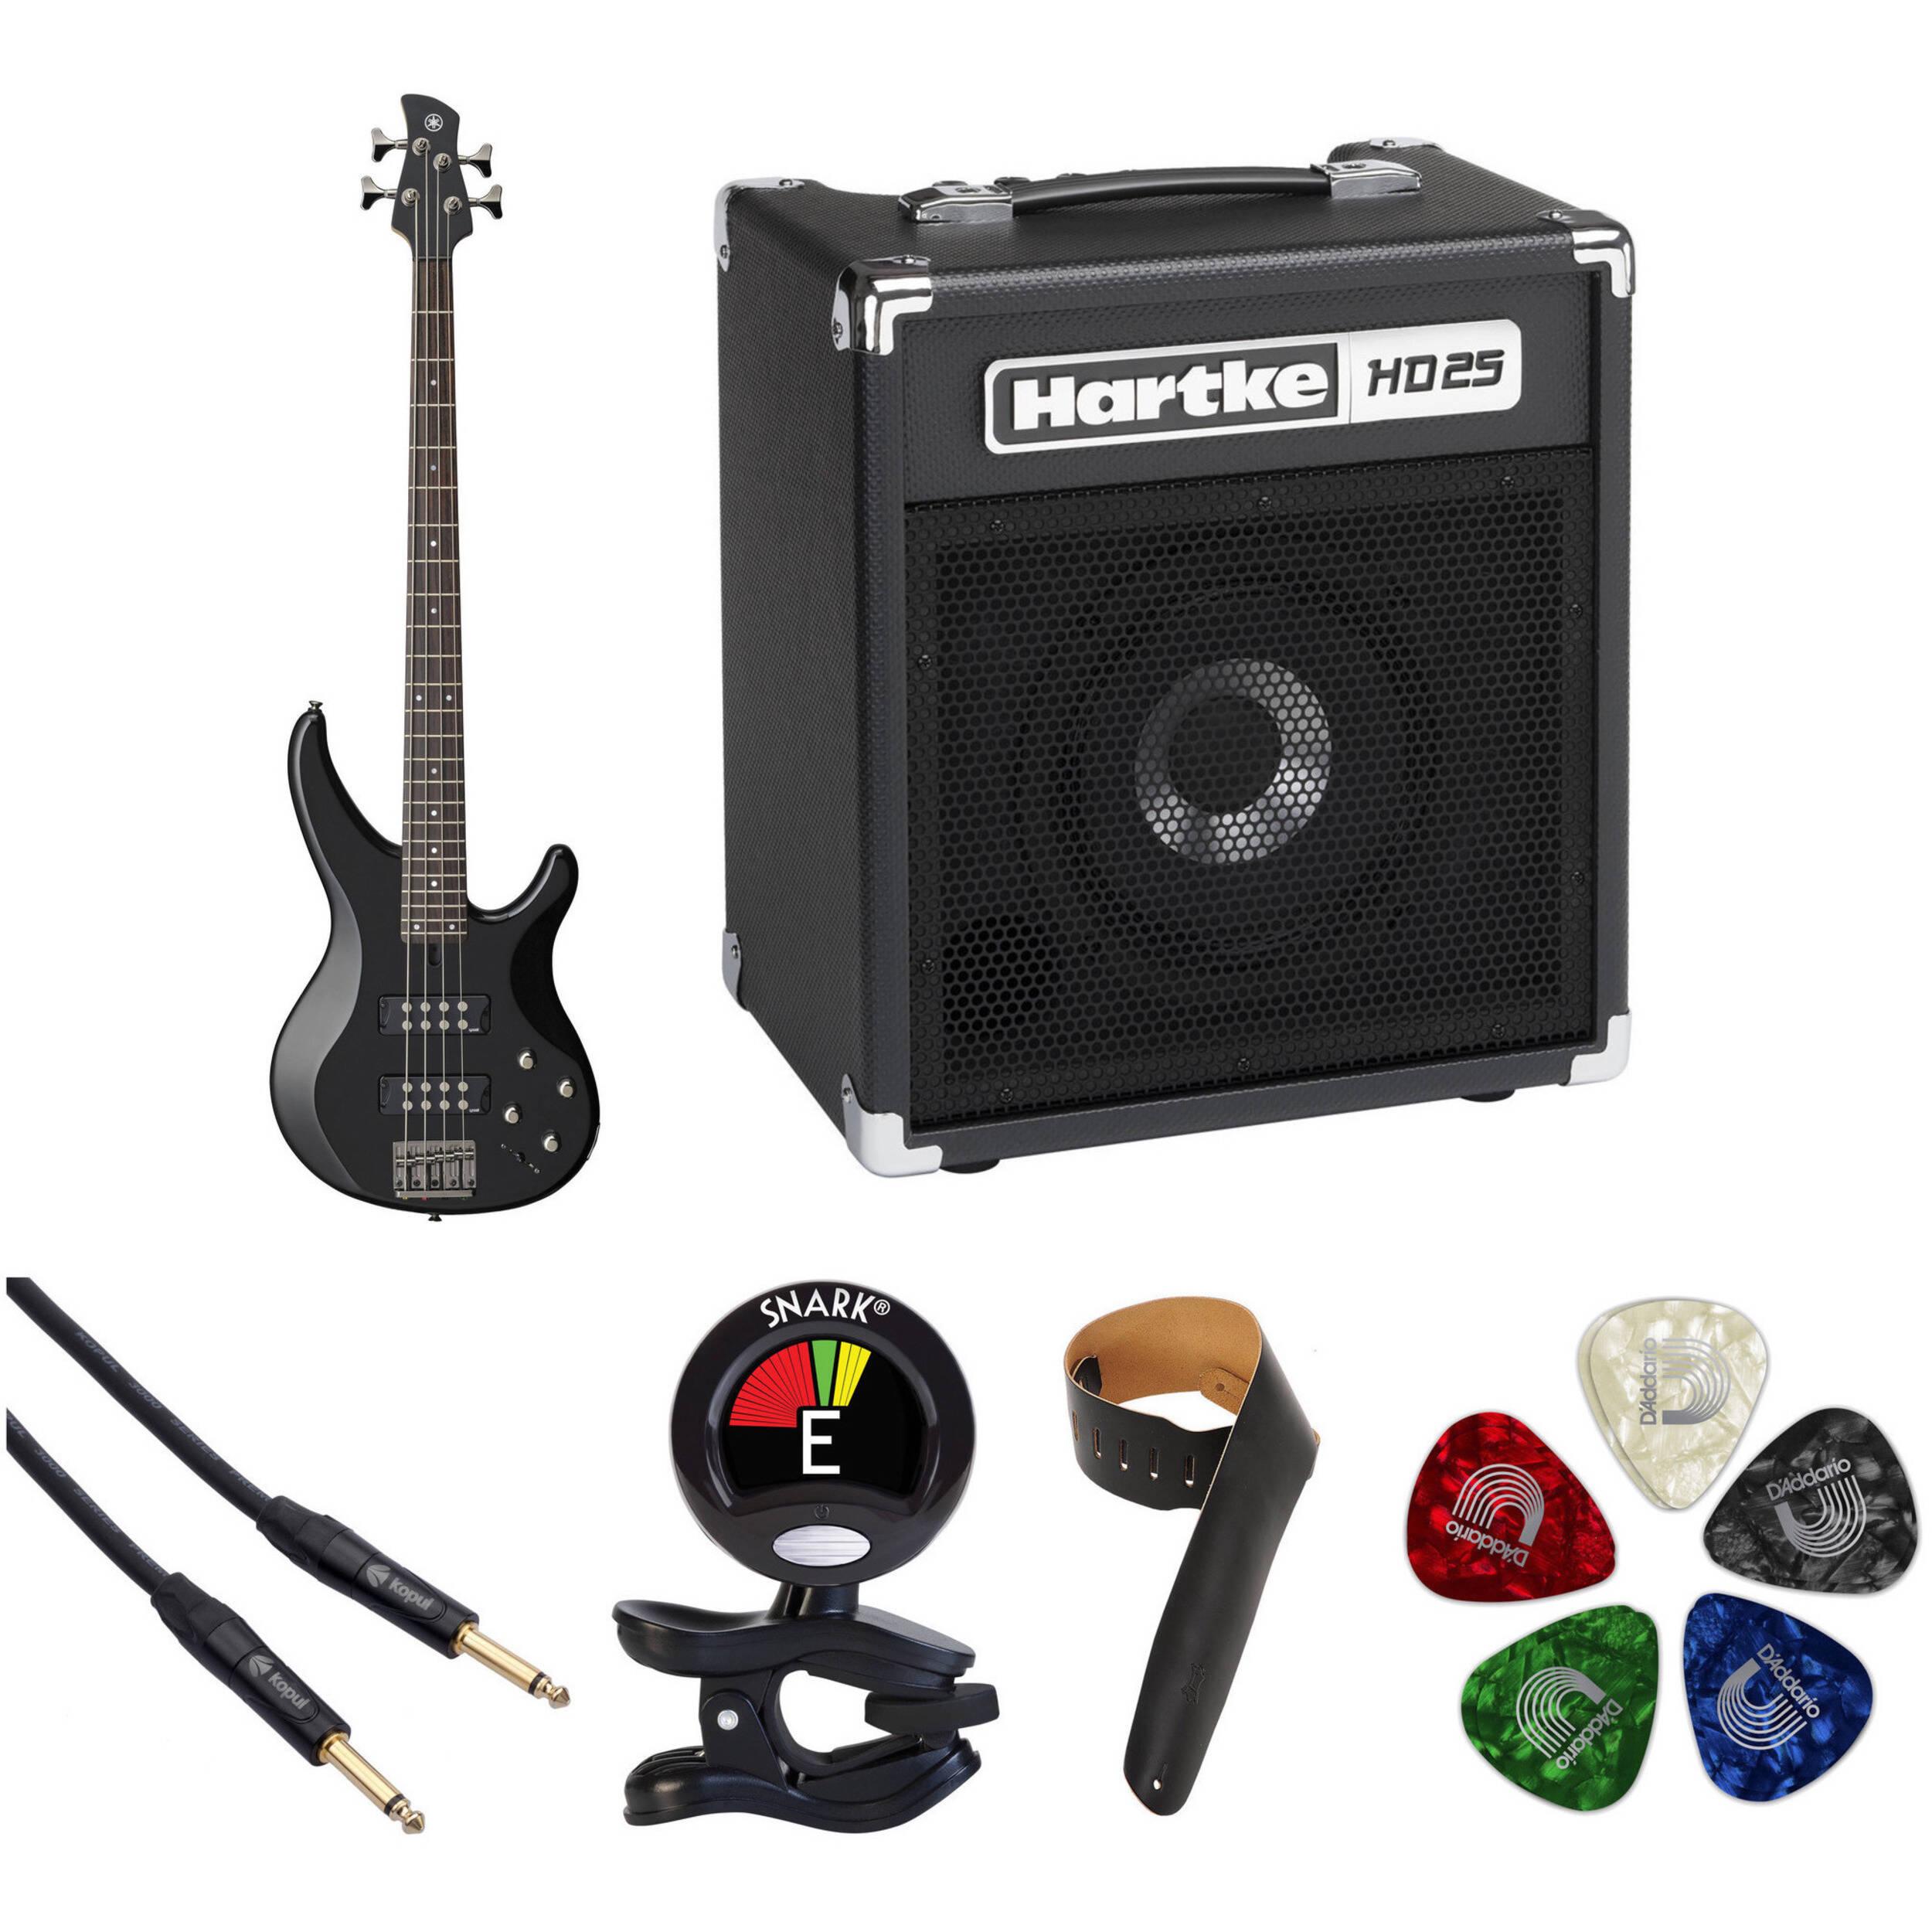 Yamaha Electric Motor Kit: Yamaha TRBX304 Electric Bass Starter Kit (Black) B&H Photo